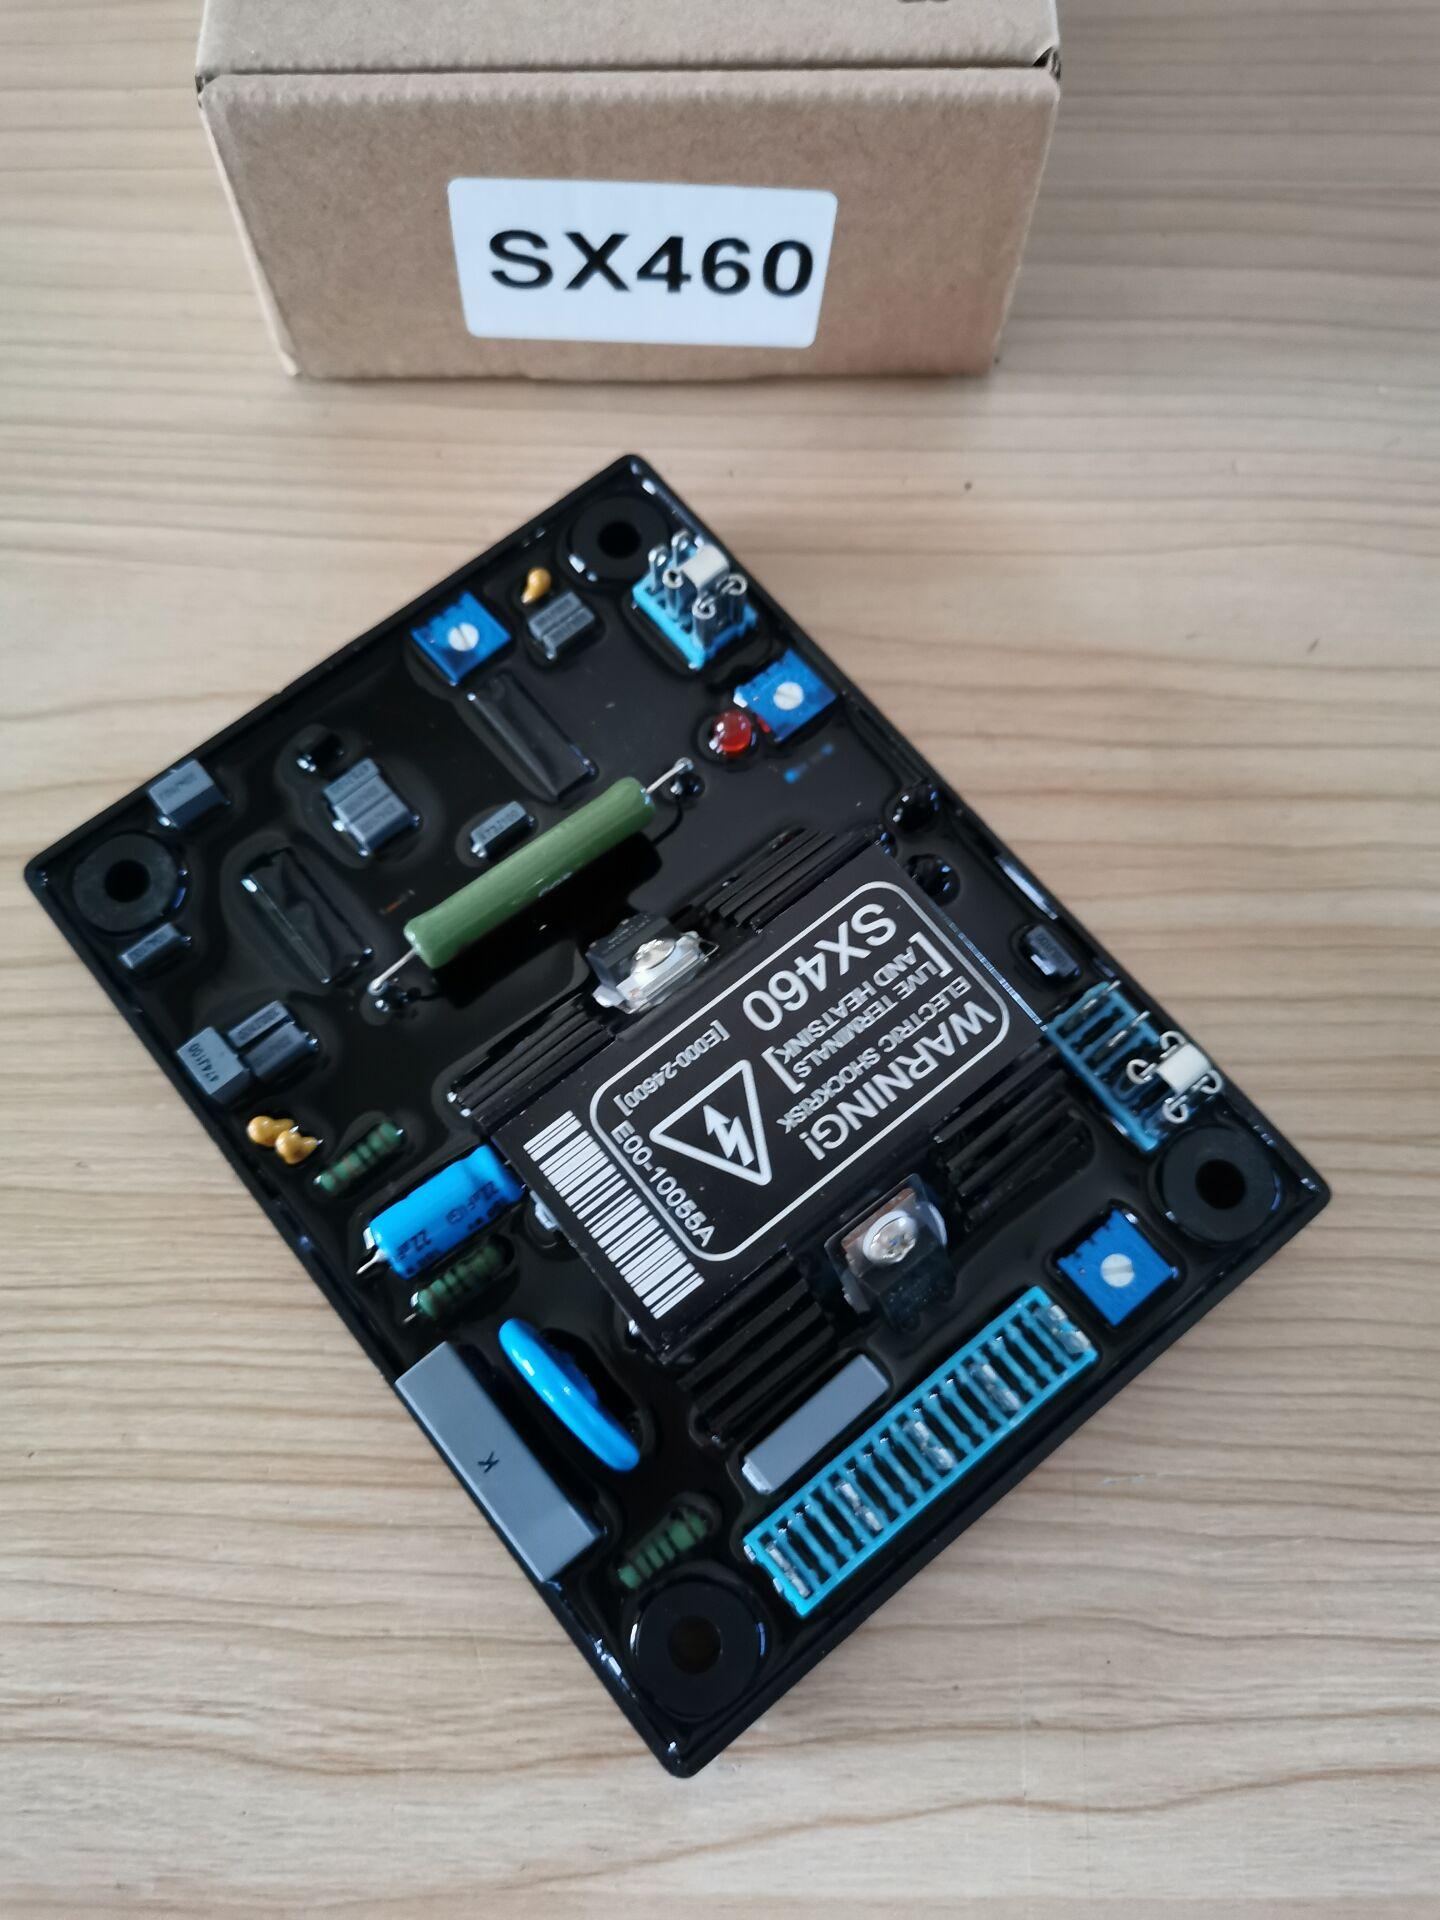 Stamford AVR SX460 автоматический регулятор напряжения для генератора